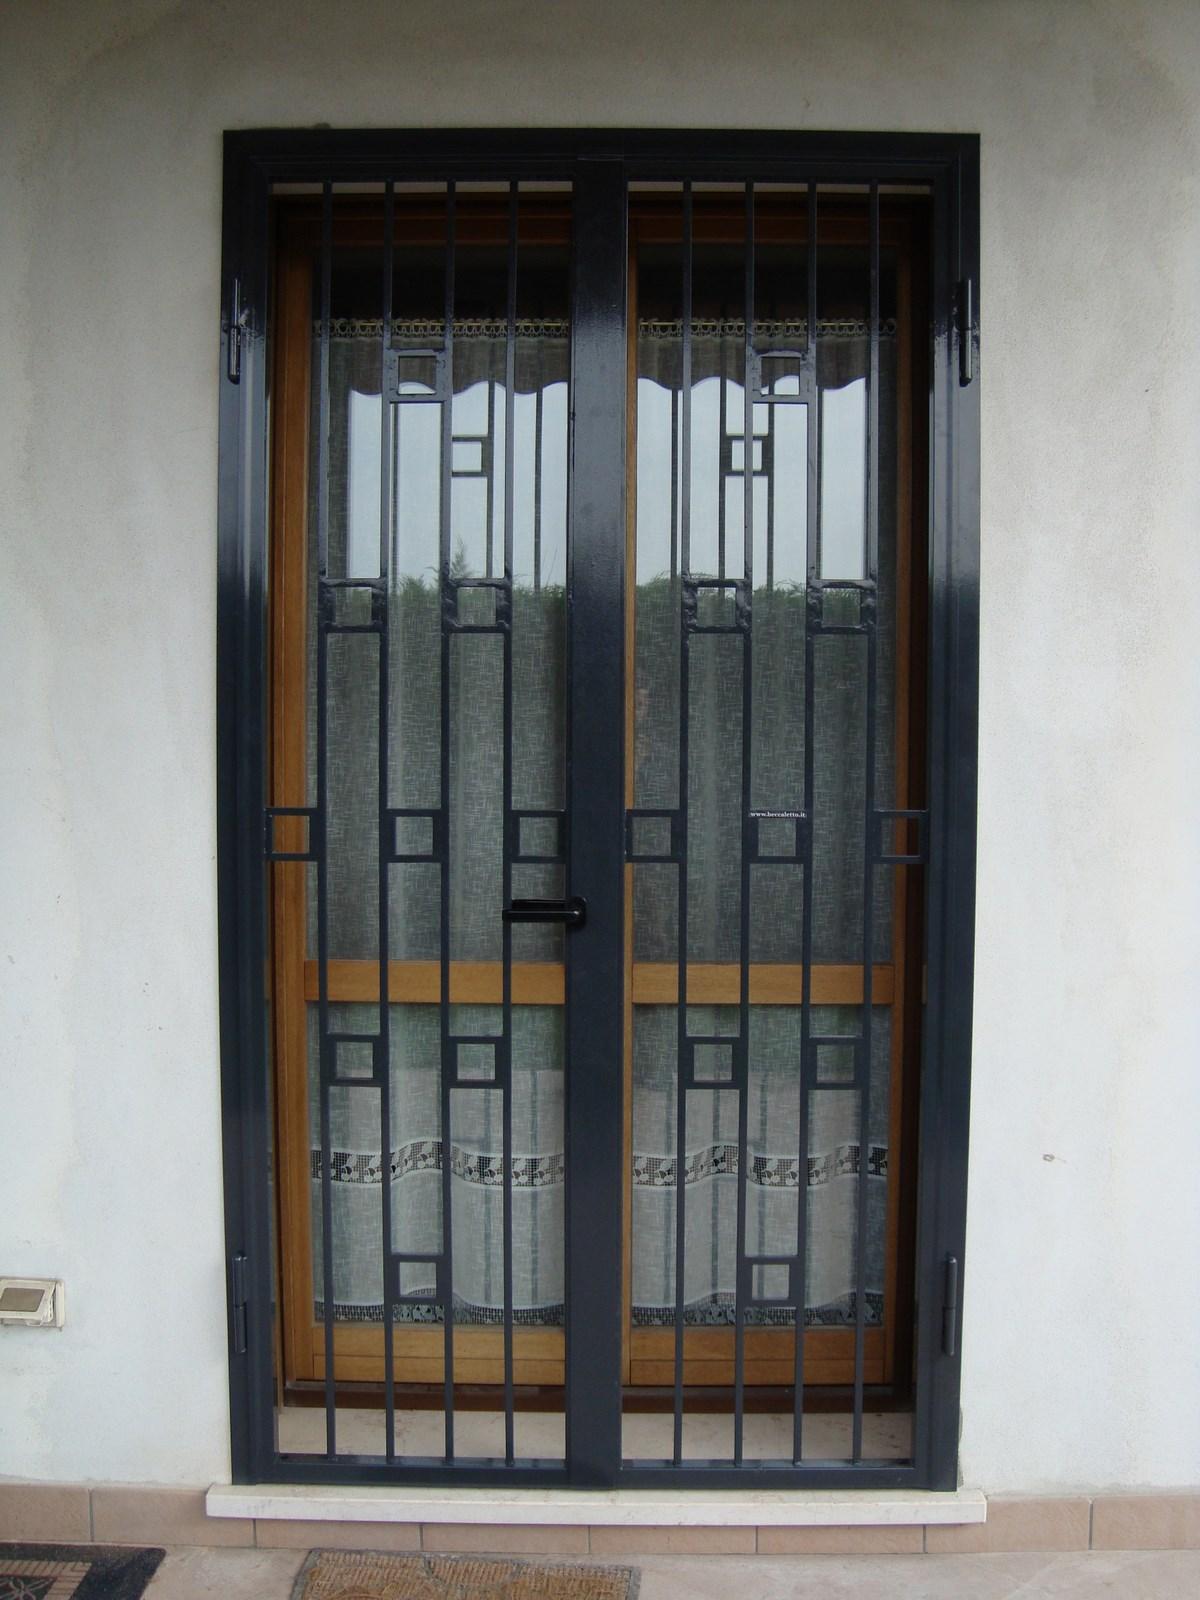 Porte inferriate in ferro battuto - Ferro battuto porta ...